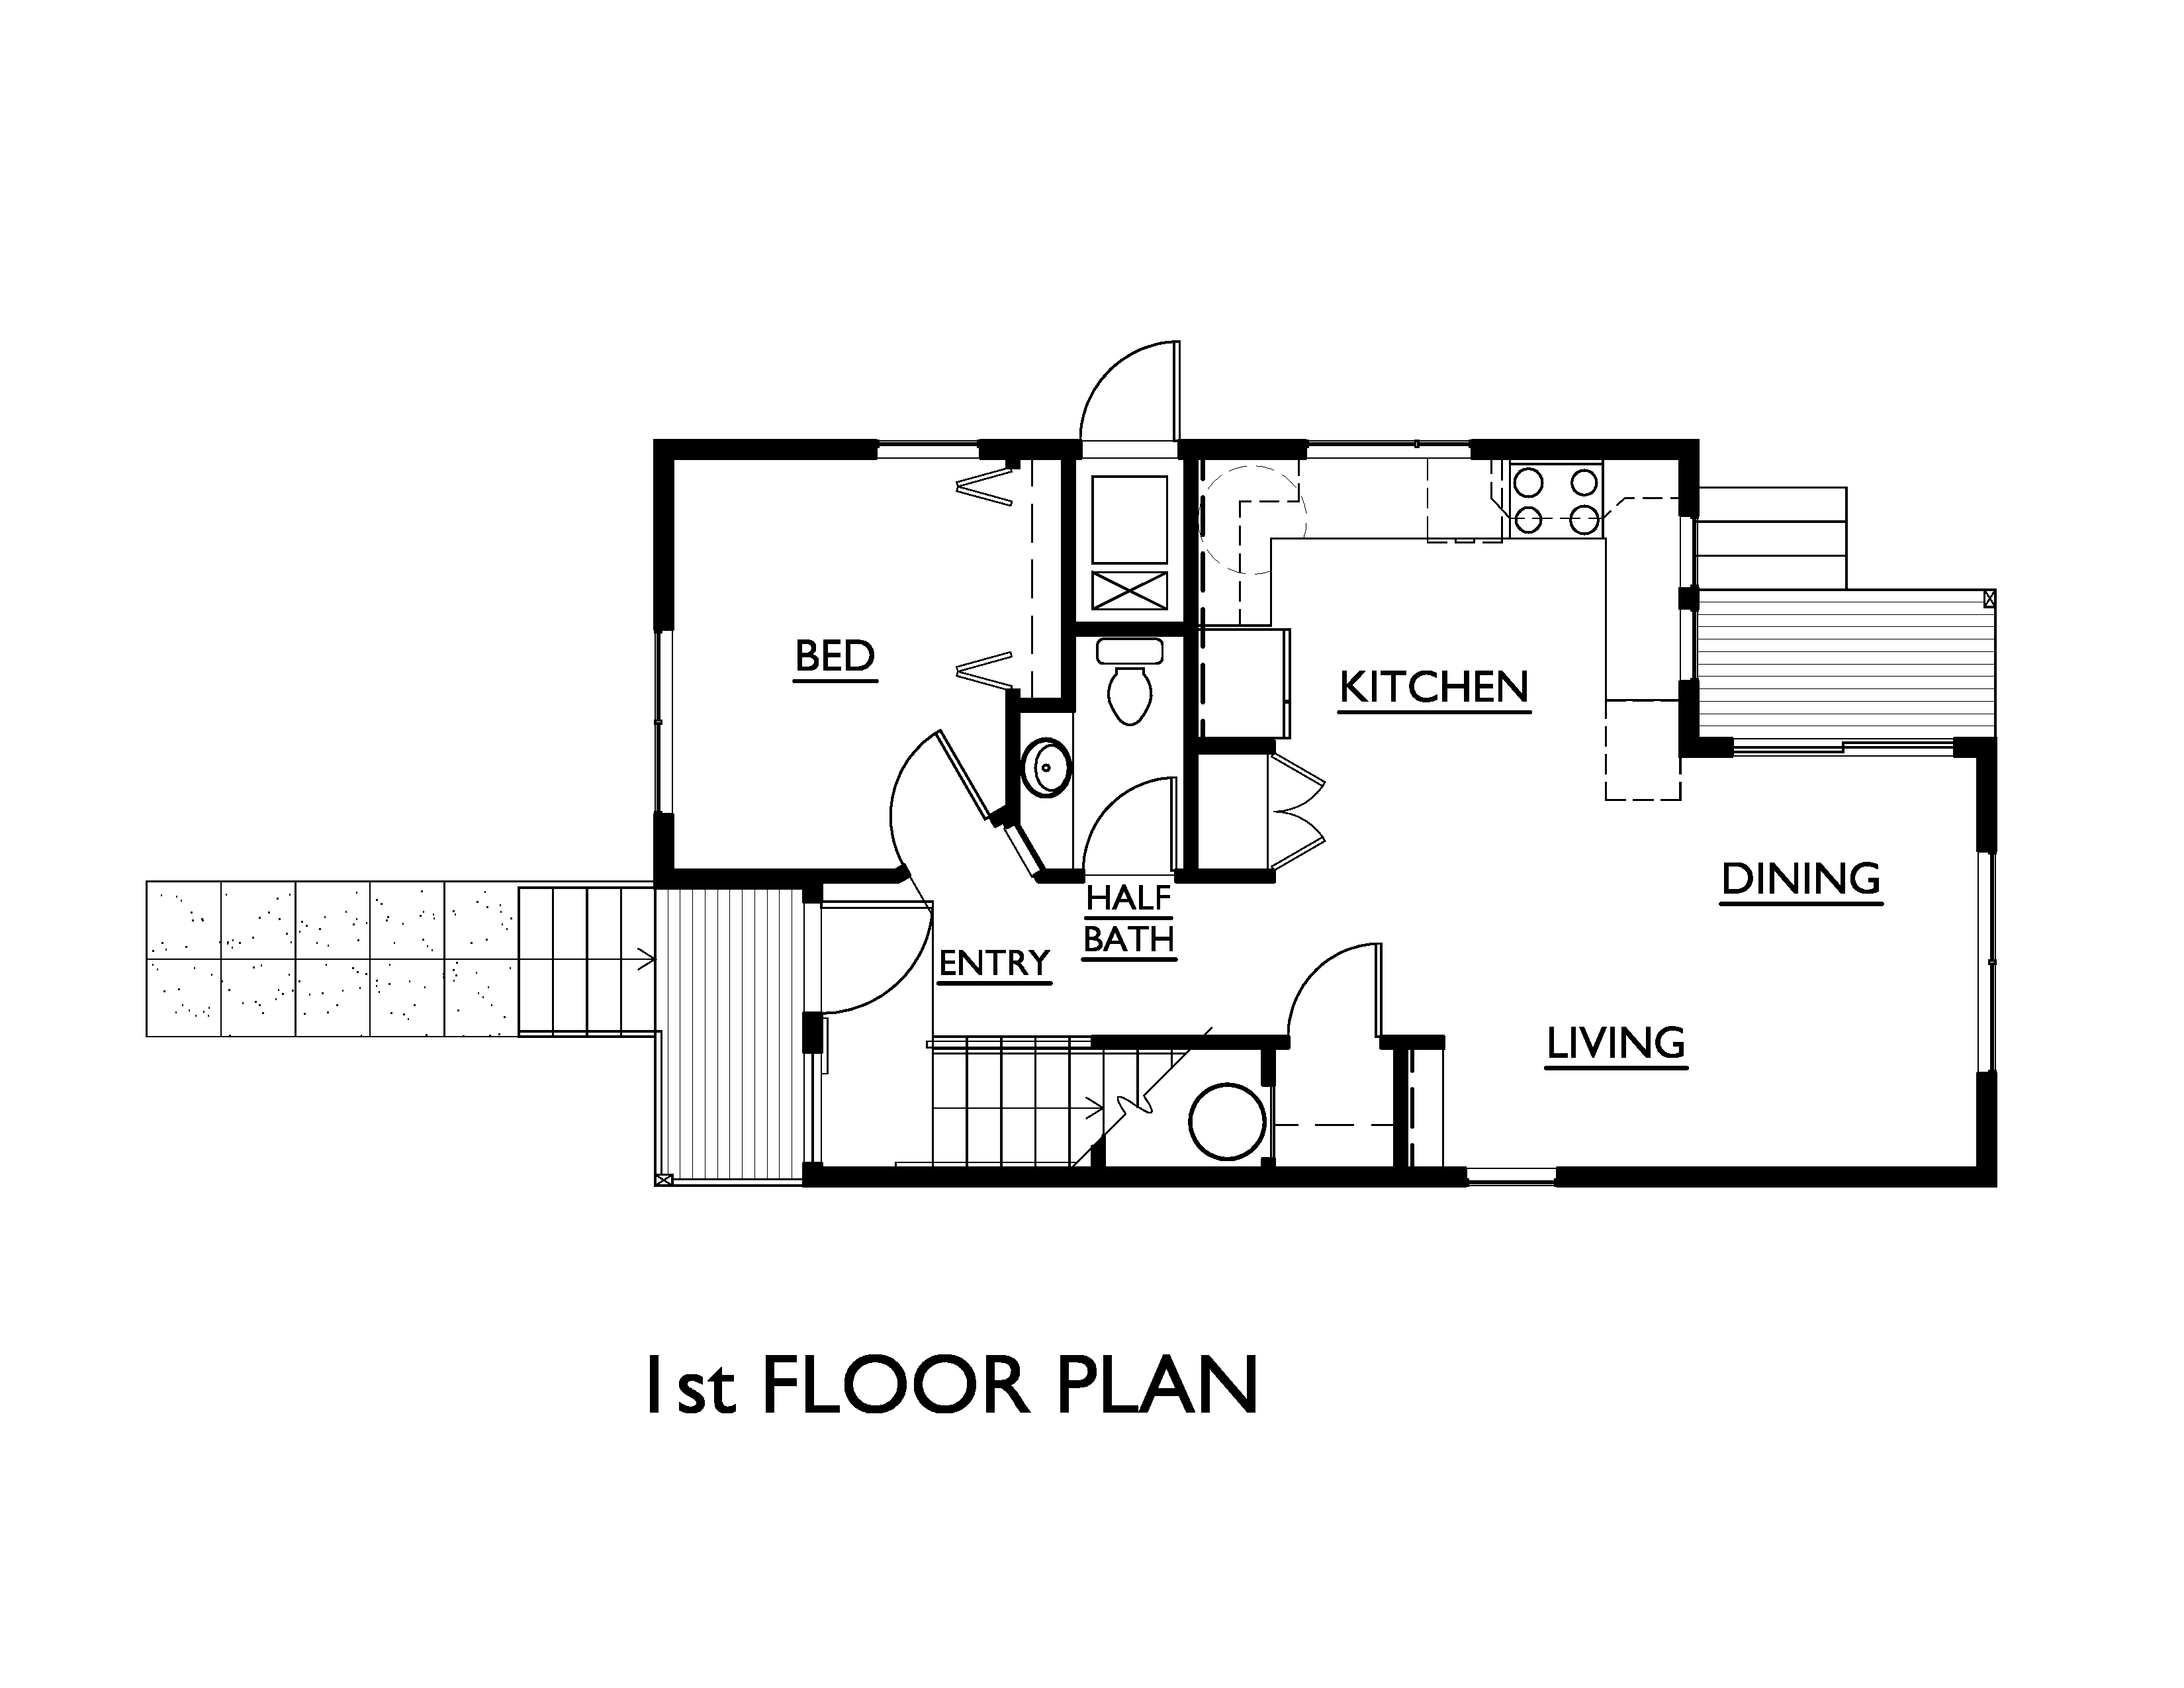 3 bedroom loft house  Modern Style House Plan   Beds  Baths  SqFt Plan  Main